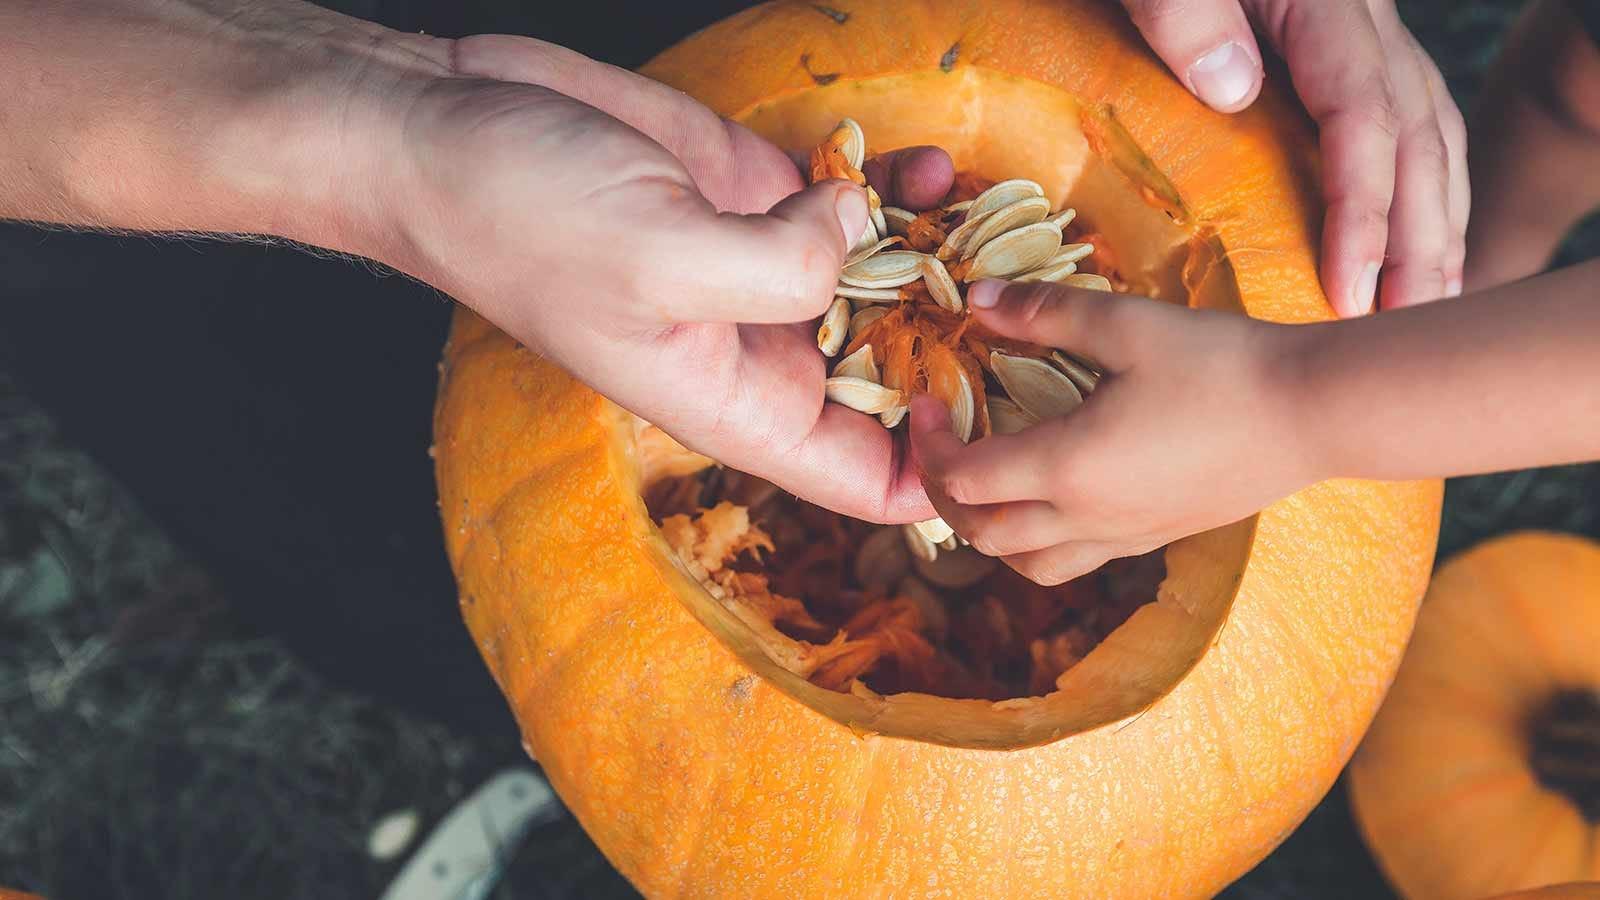 parent and child scooping pumpkin seeds out of a pumpkin